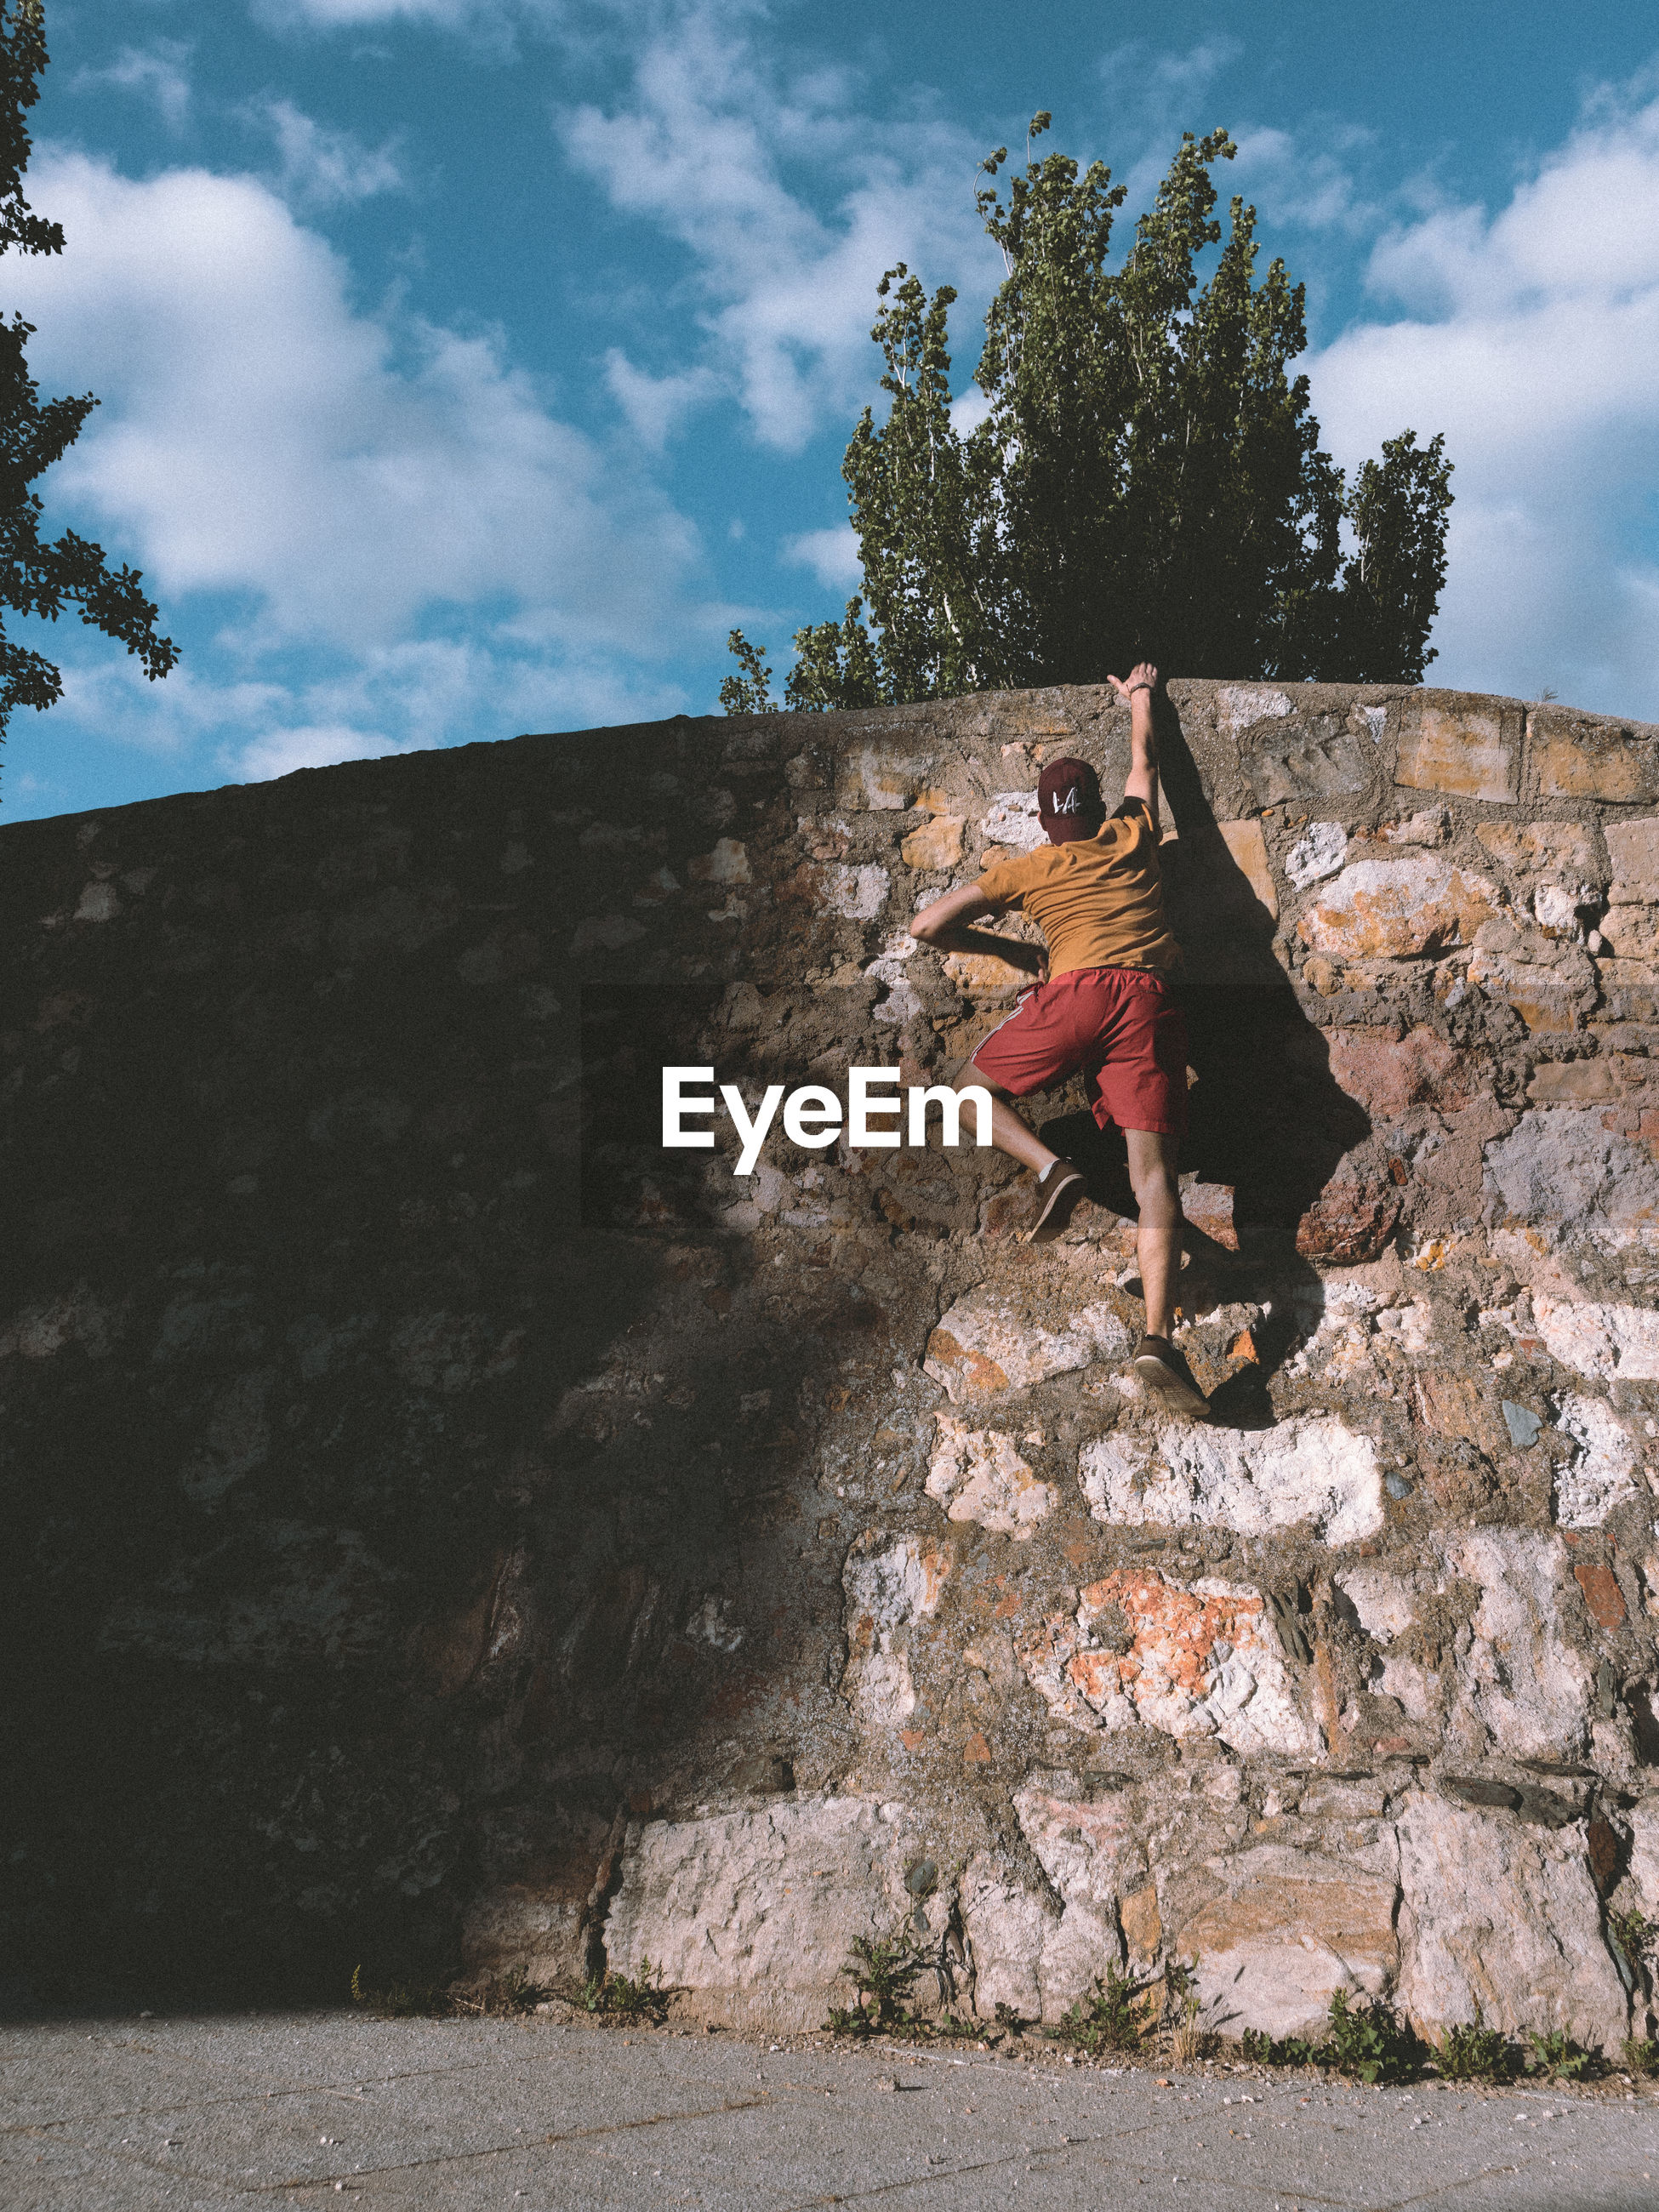 A man climbing a stone wall